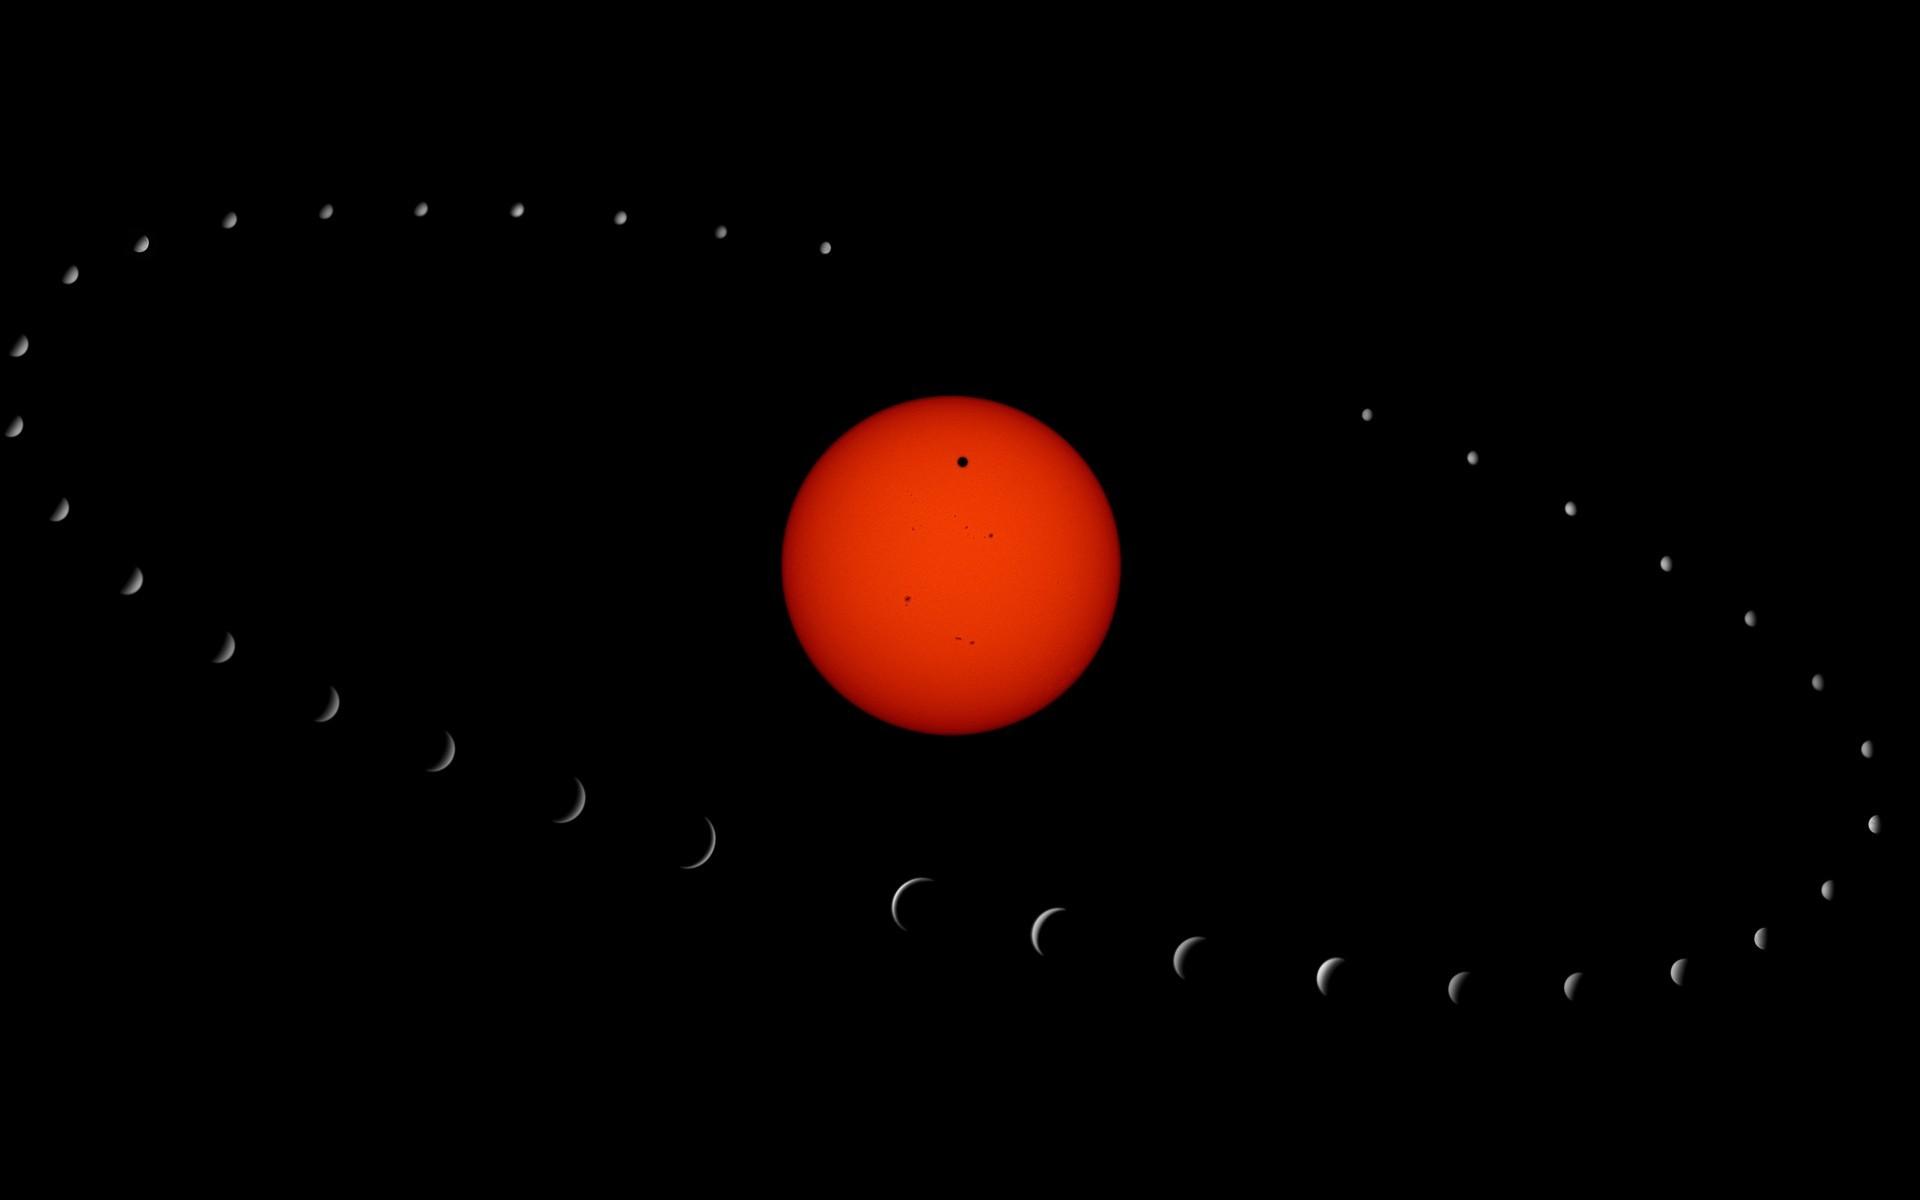 Space / Sun Wallpaper